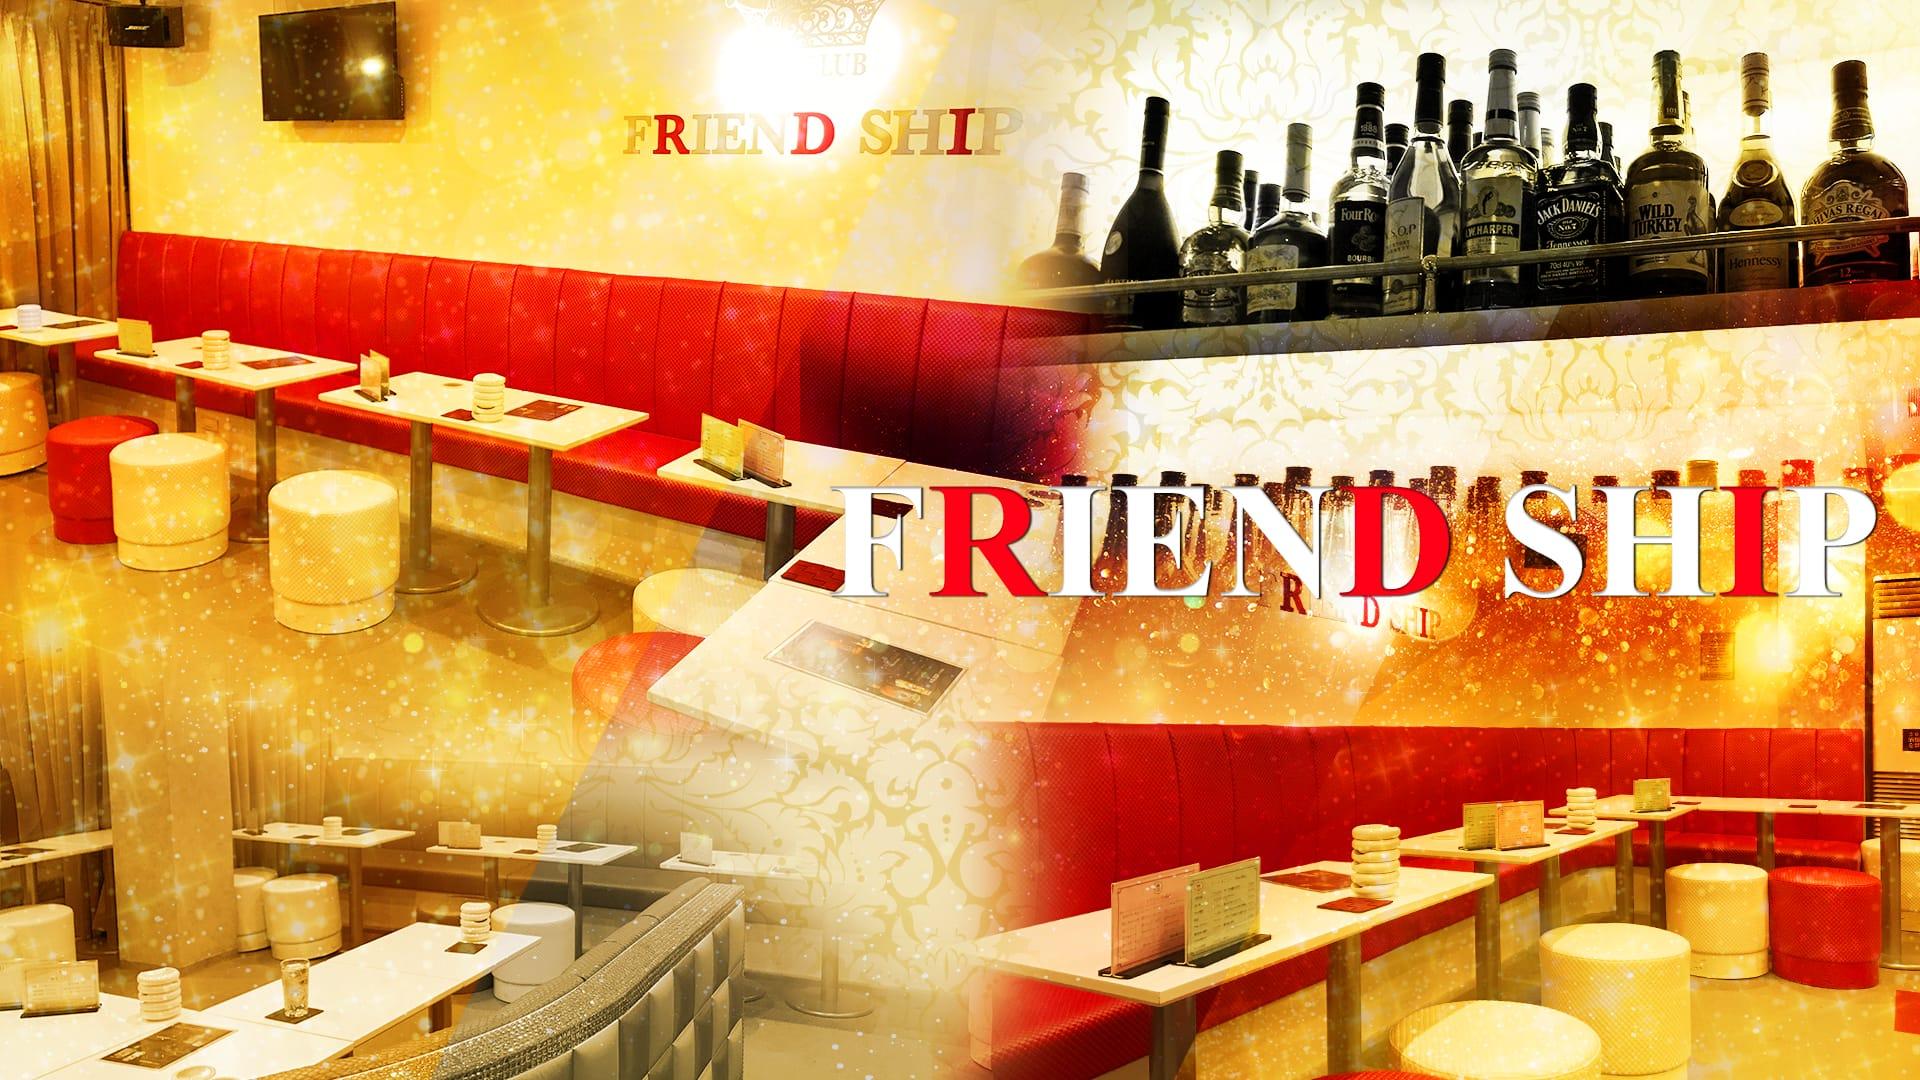 FRIEND SHIP(フレンドシップ) 武蔵小杉パブクラブ TOP画像